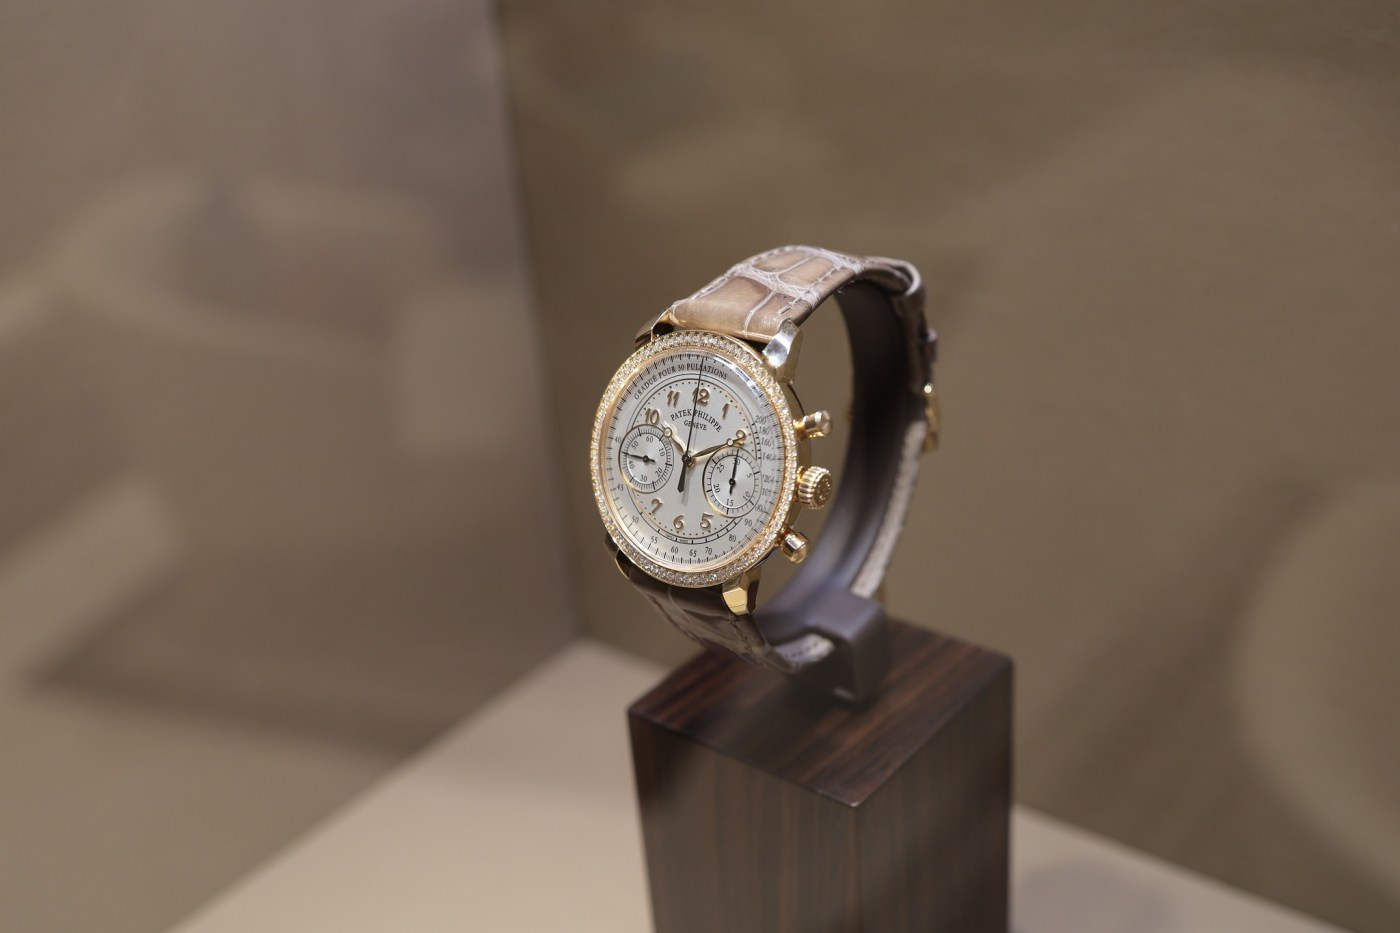 Patek Philippe 7150-250R Chronograph, $83,919